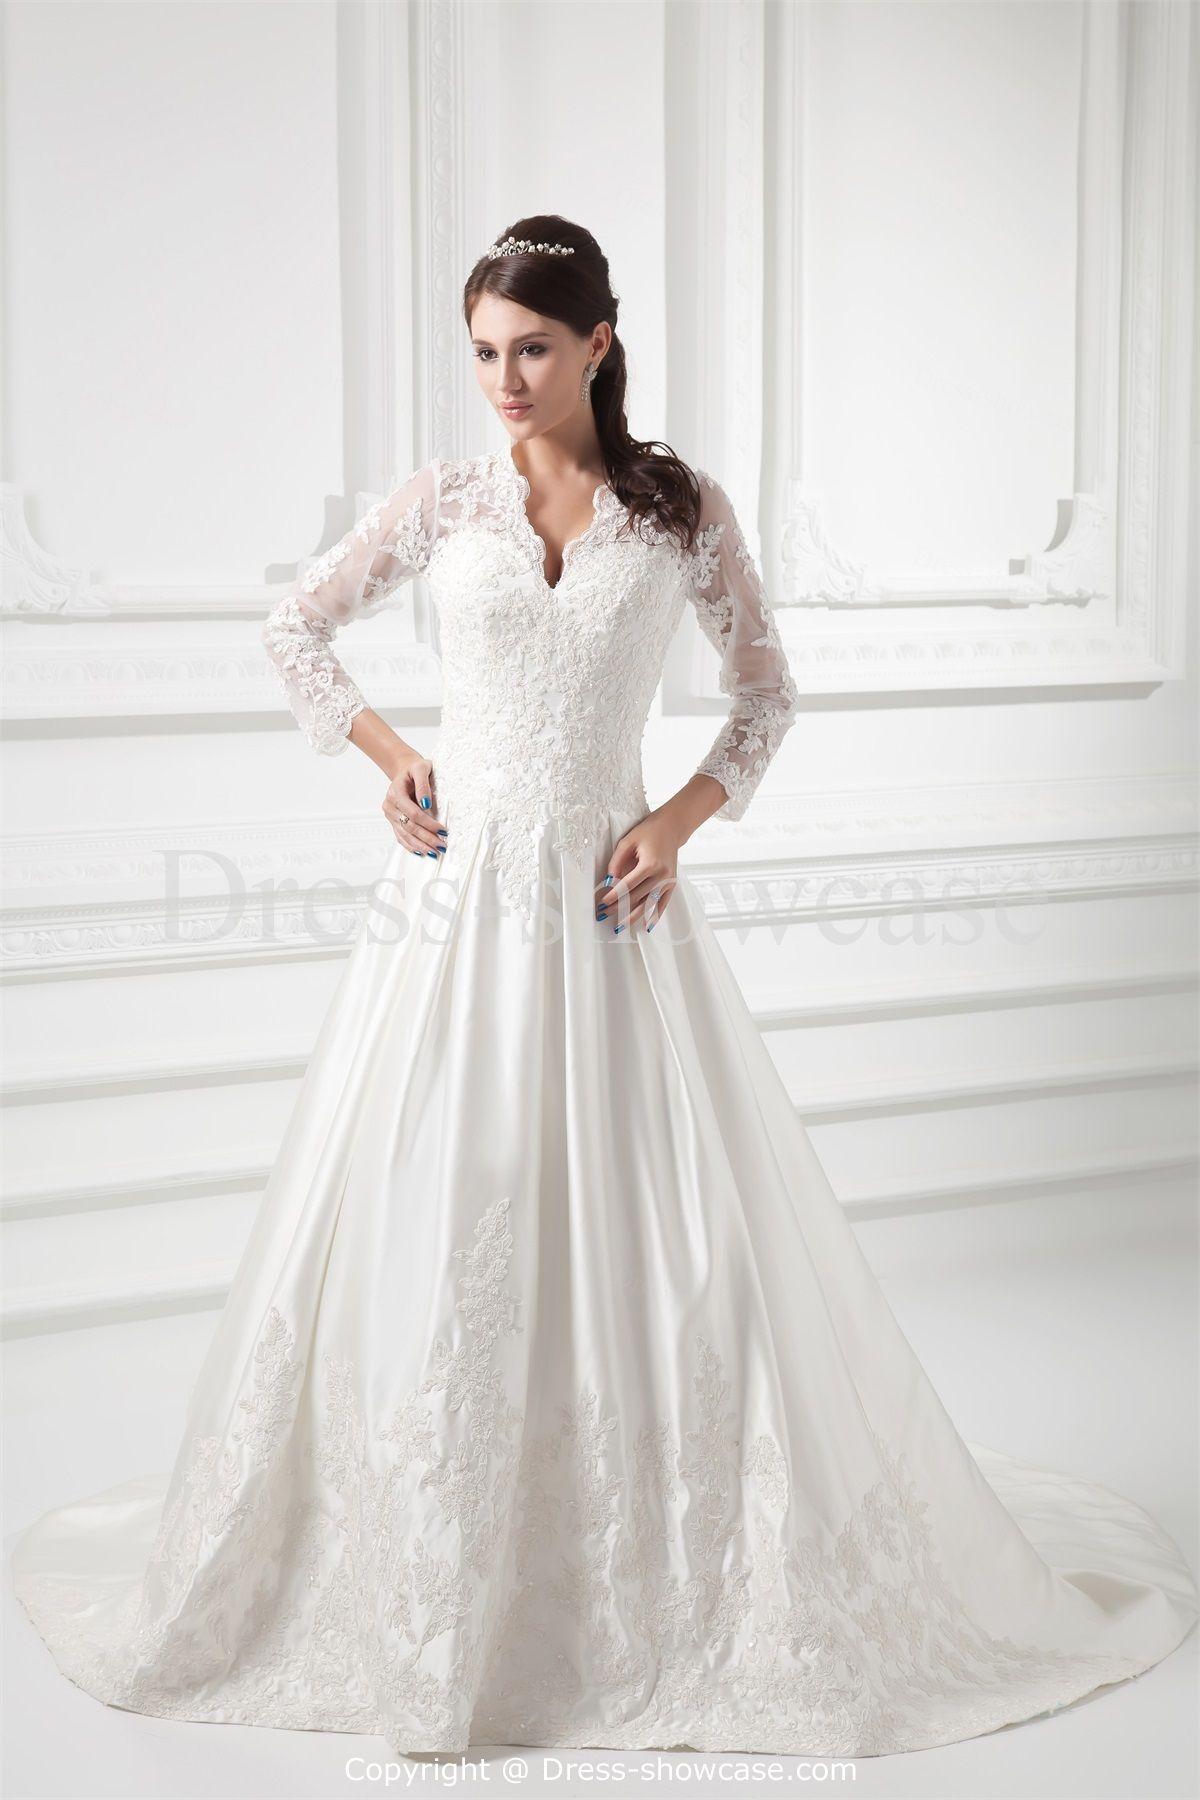 3 4 sleeve wedding gowns weddingdress pinterest wedding